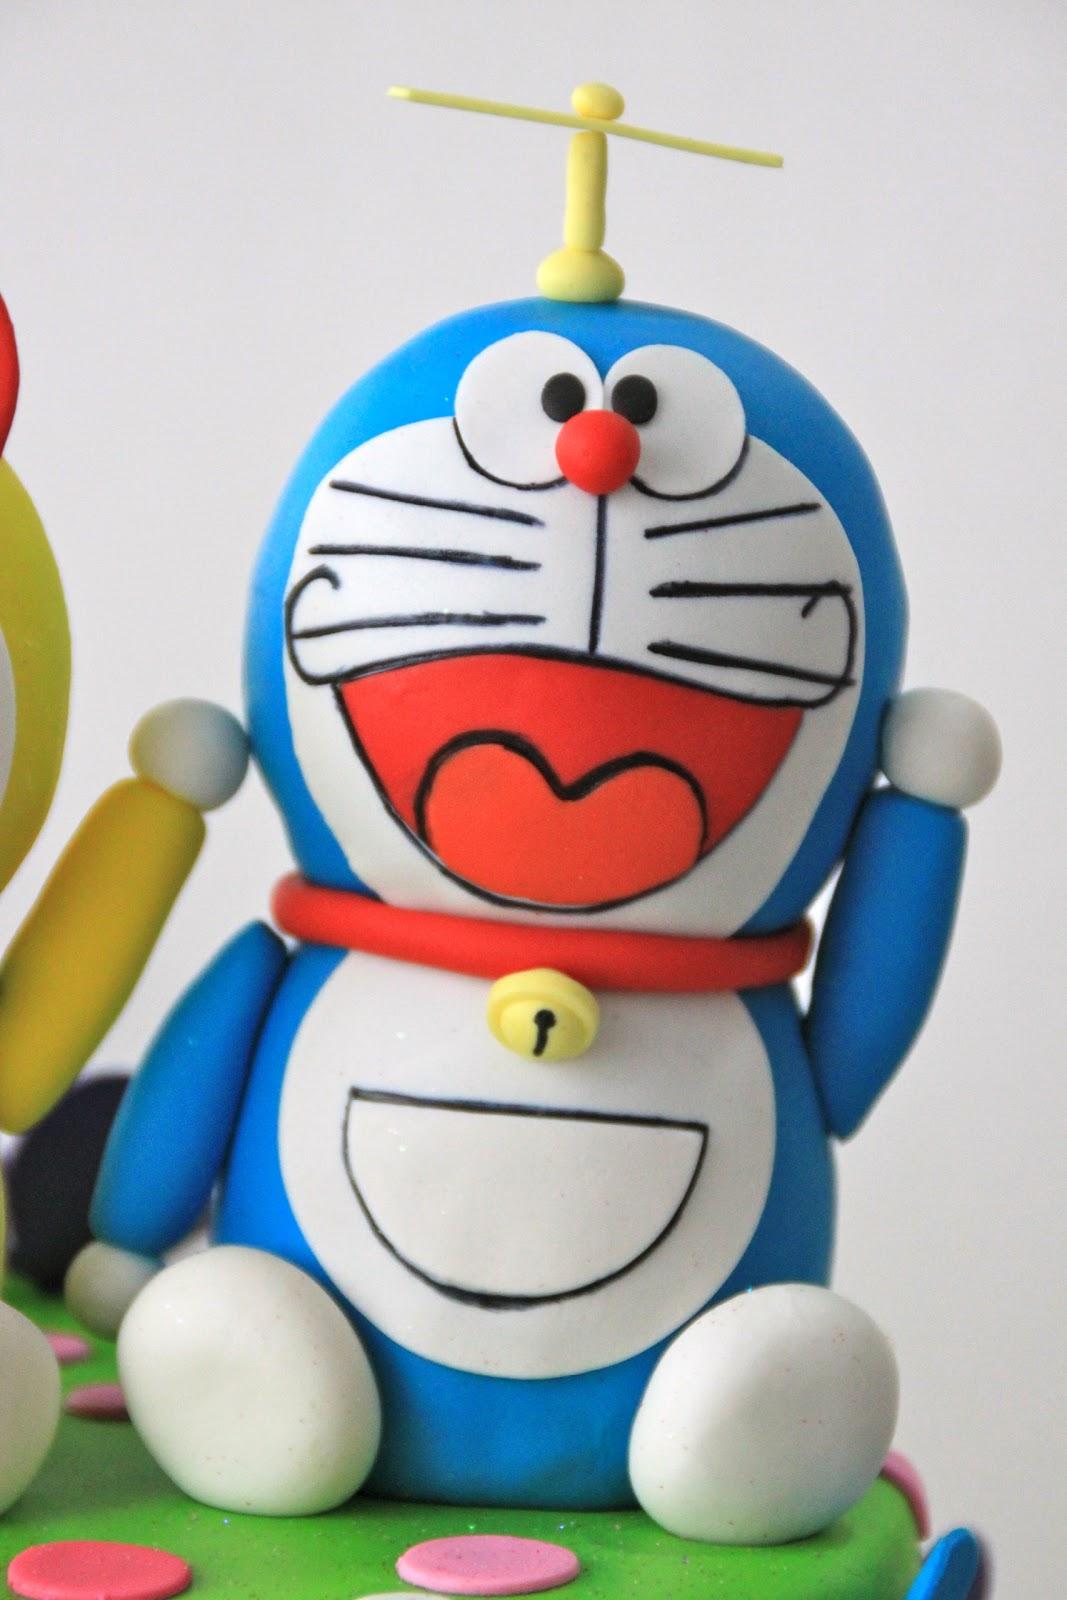 Celebrate with Cake!: Doraemon and Dorami Cake